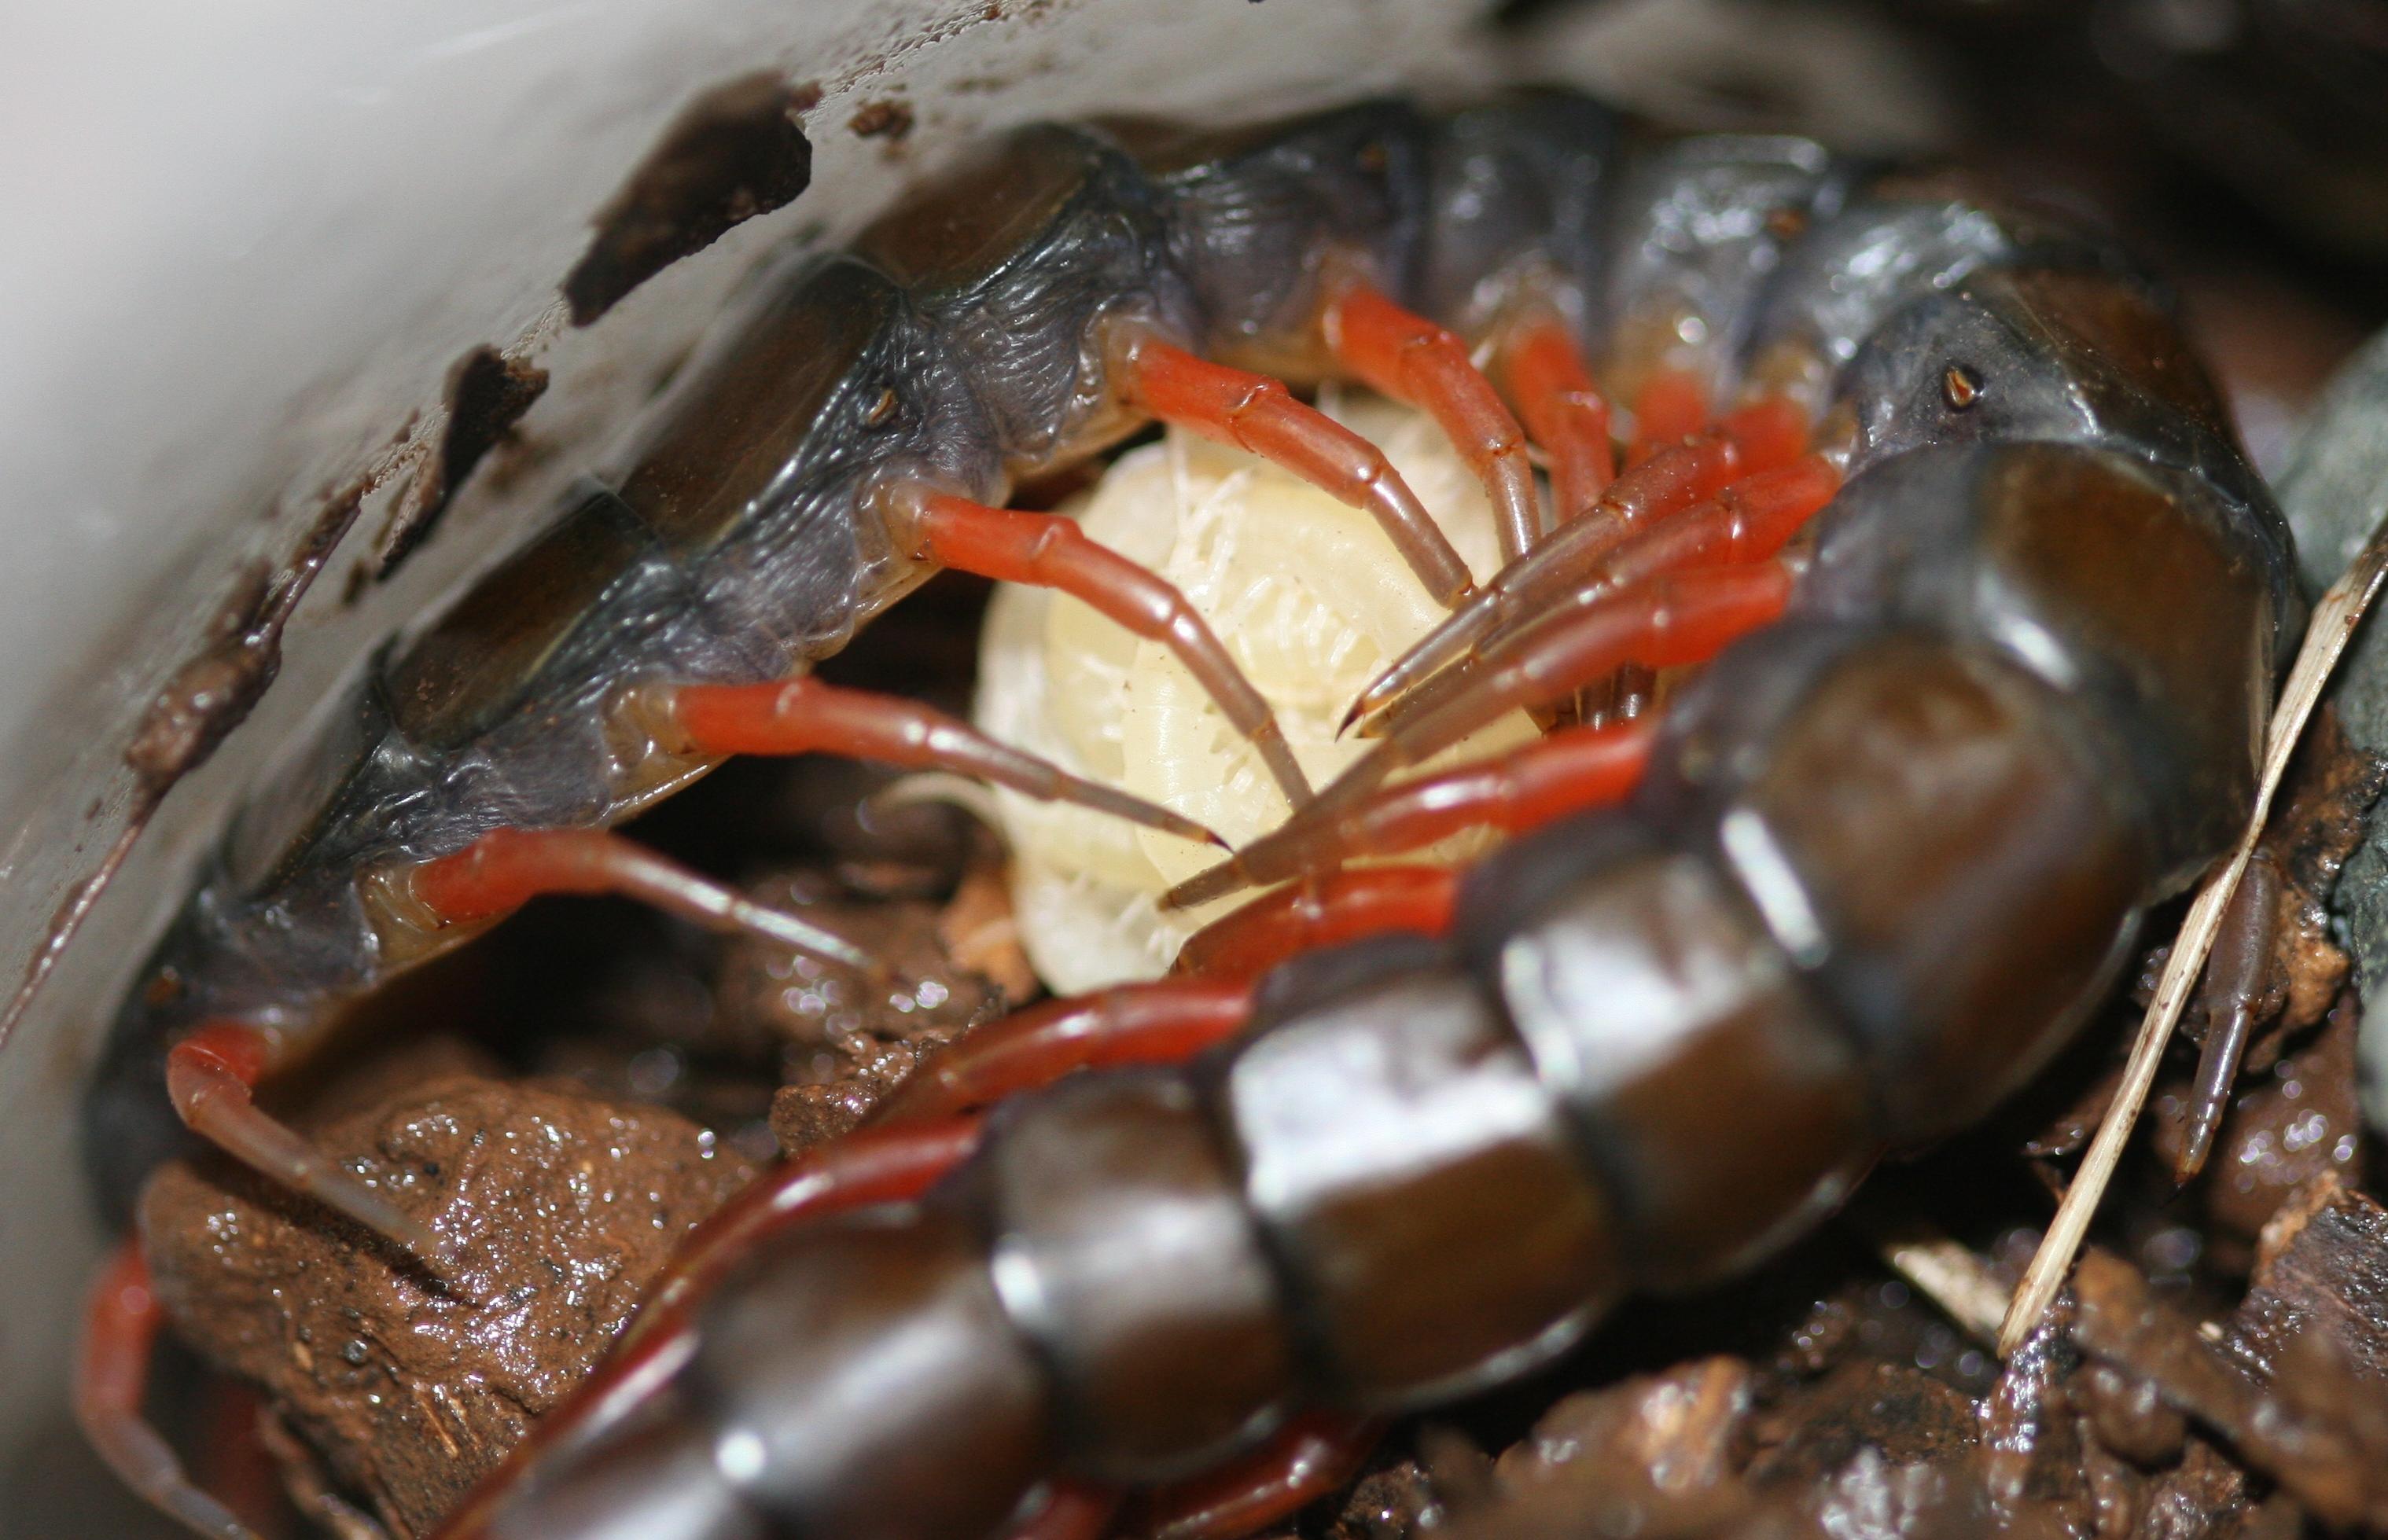 the weight of scolopendra gigantea centipede